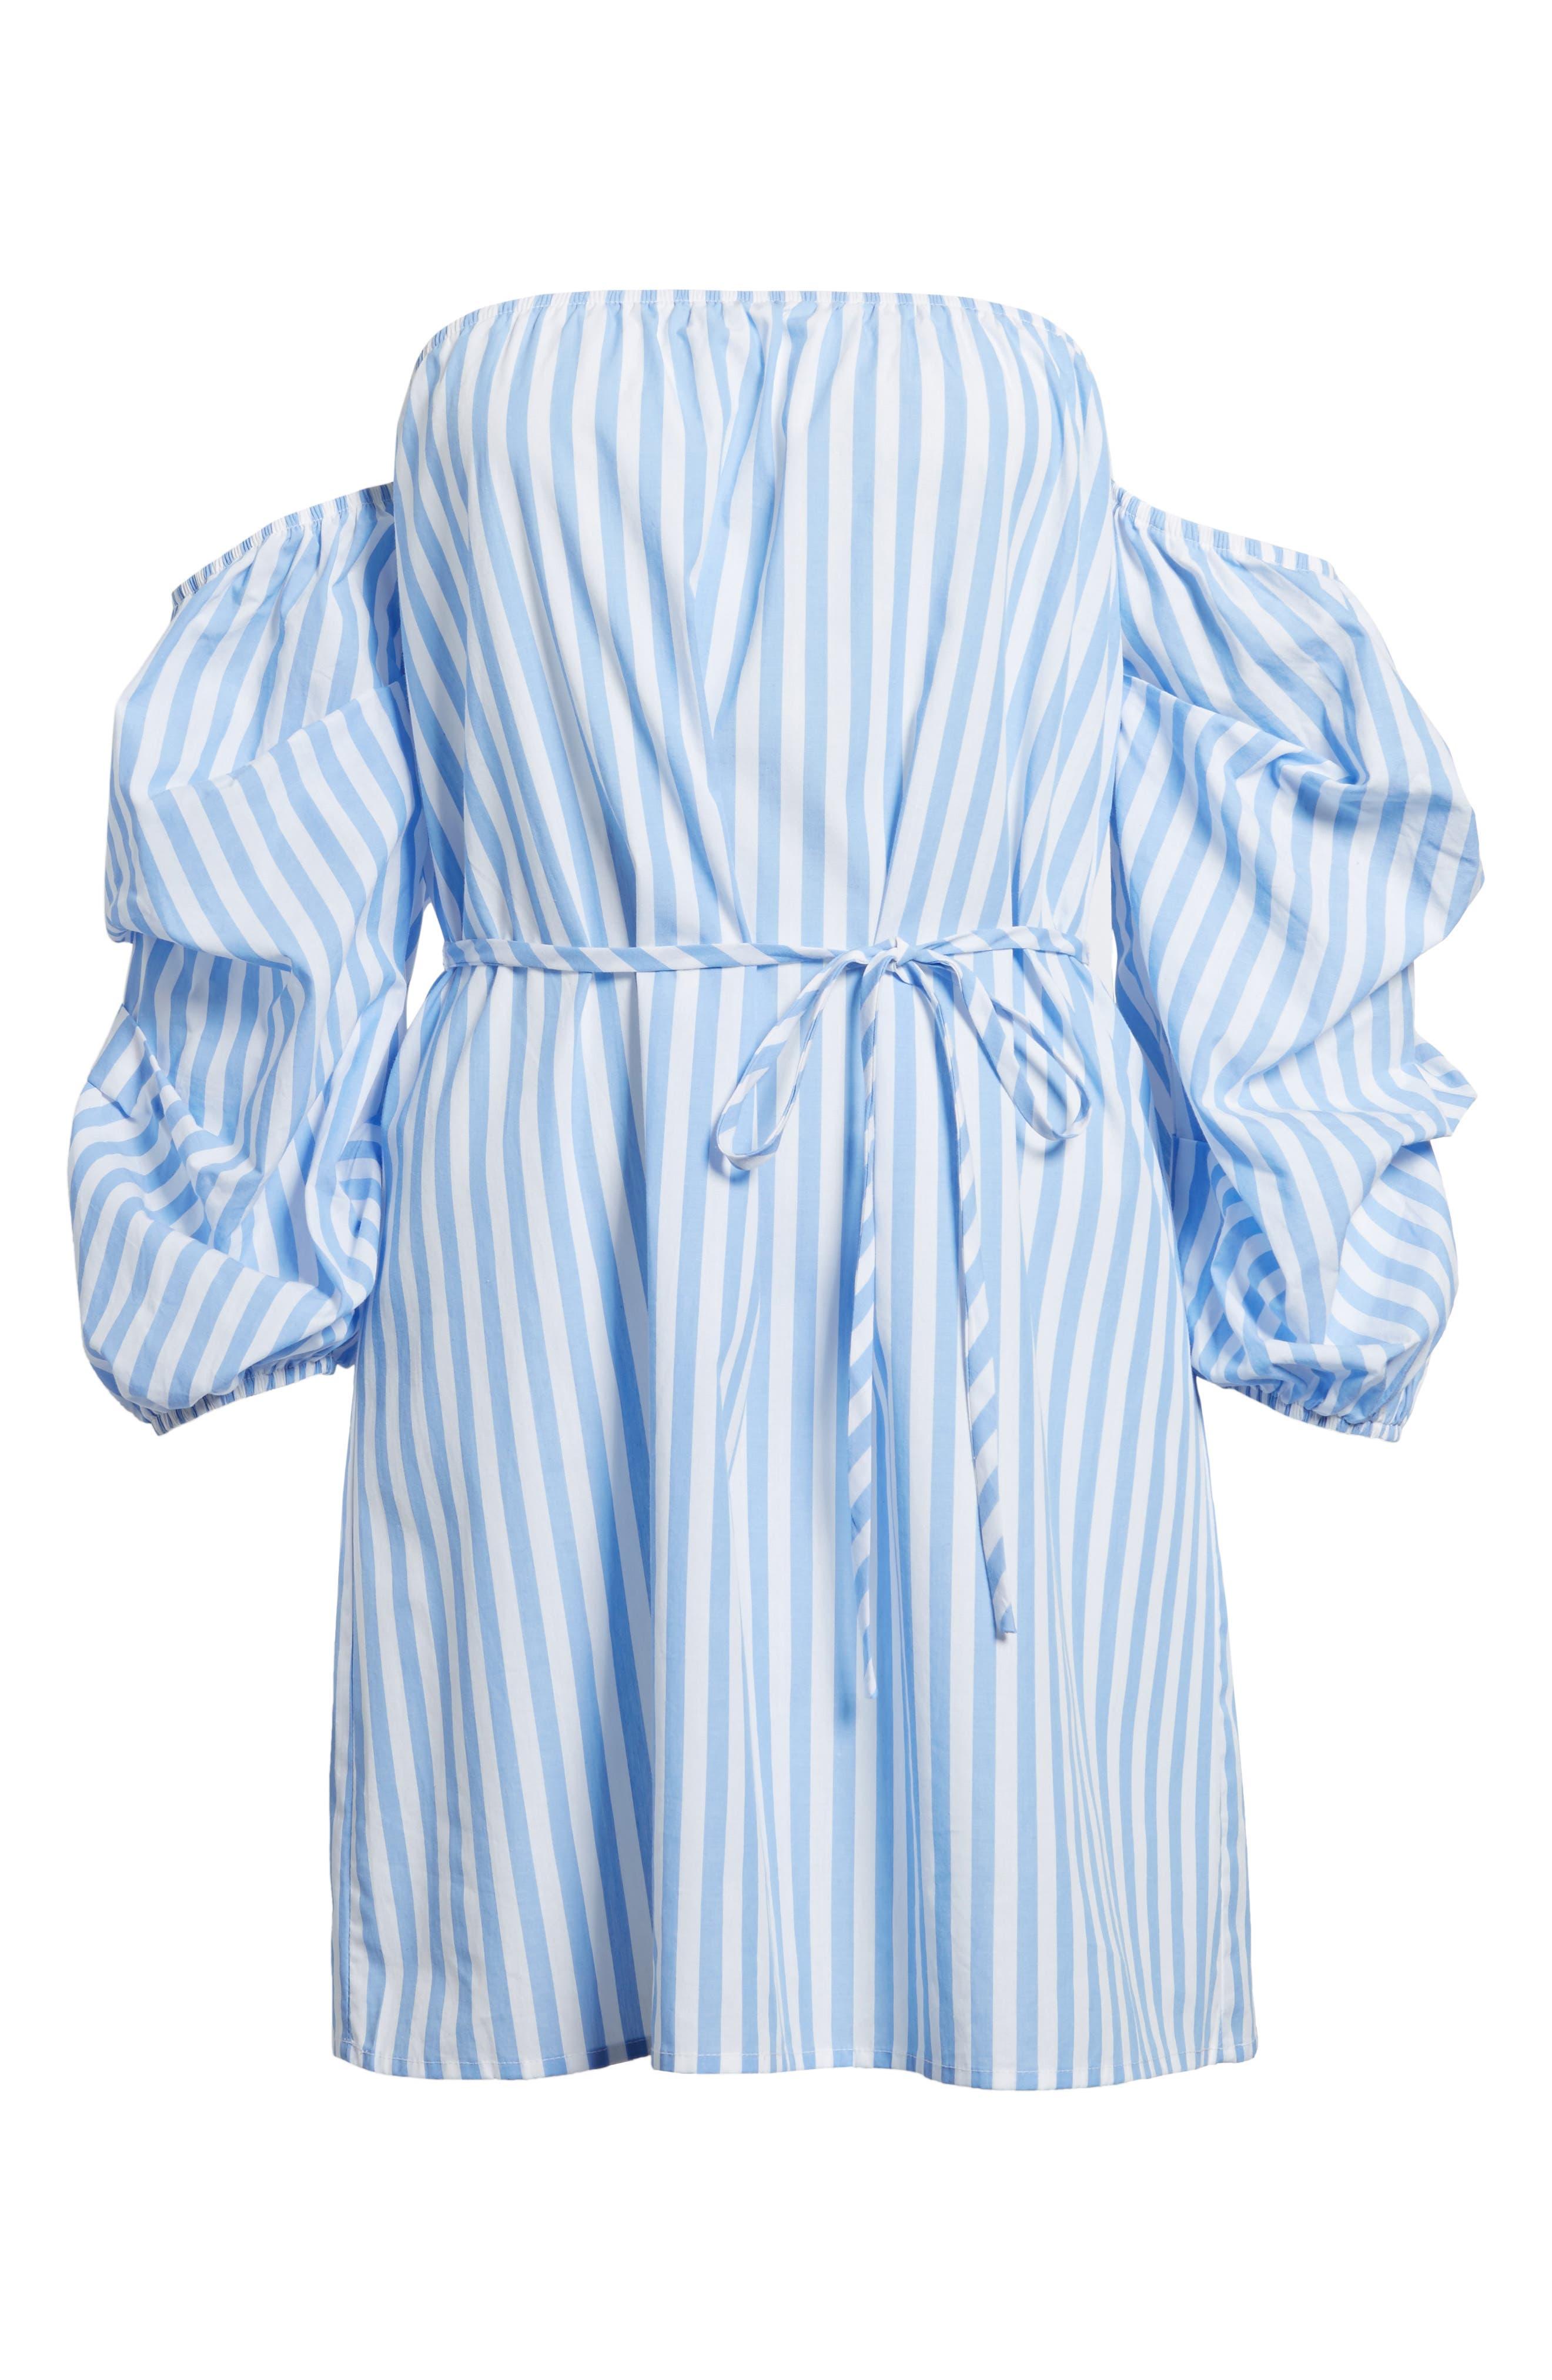 Off the Shoulder Stripe Minidress,                             Alternate thumbnail 6, color,                             100